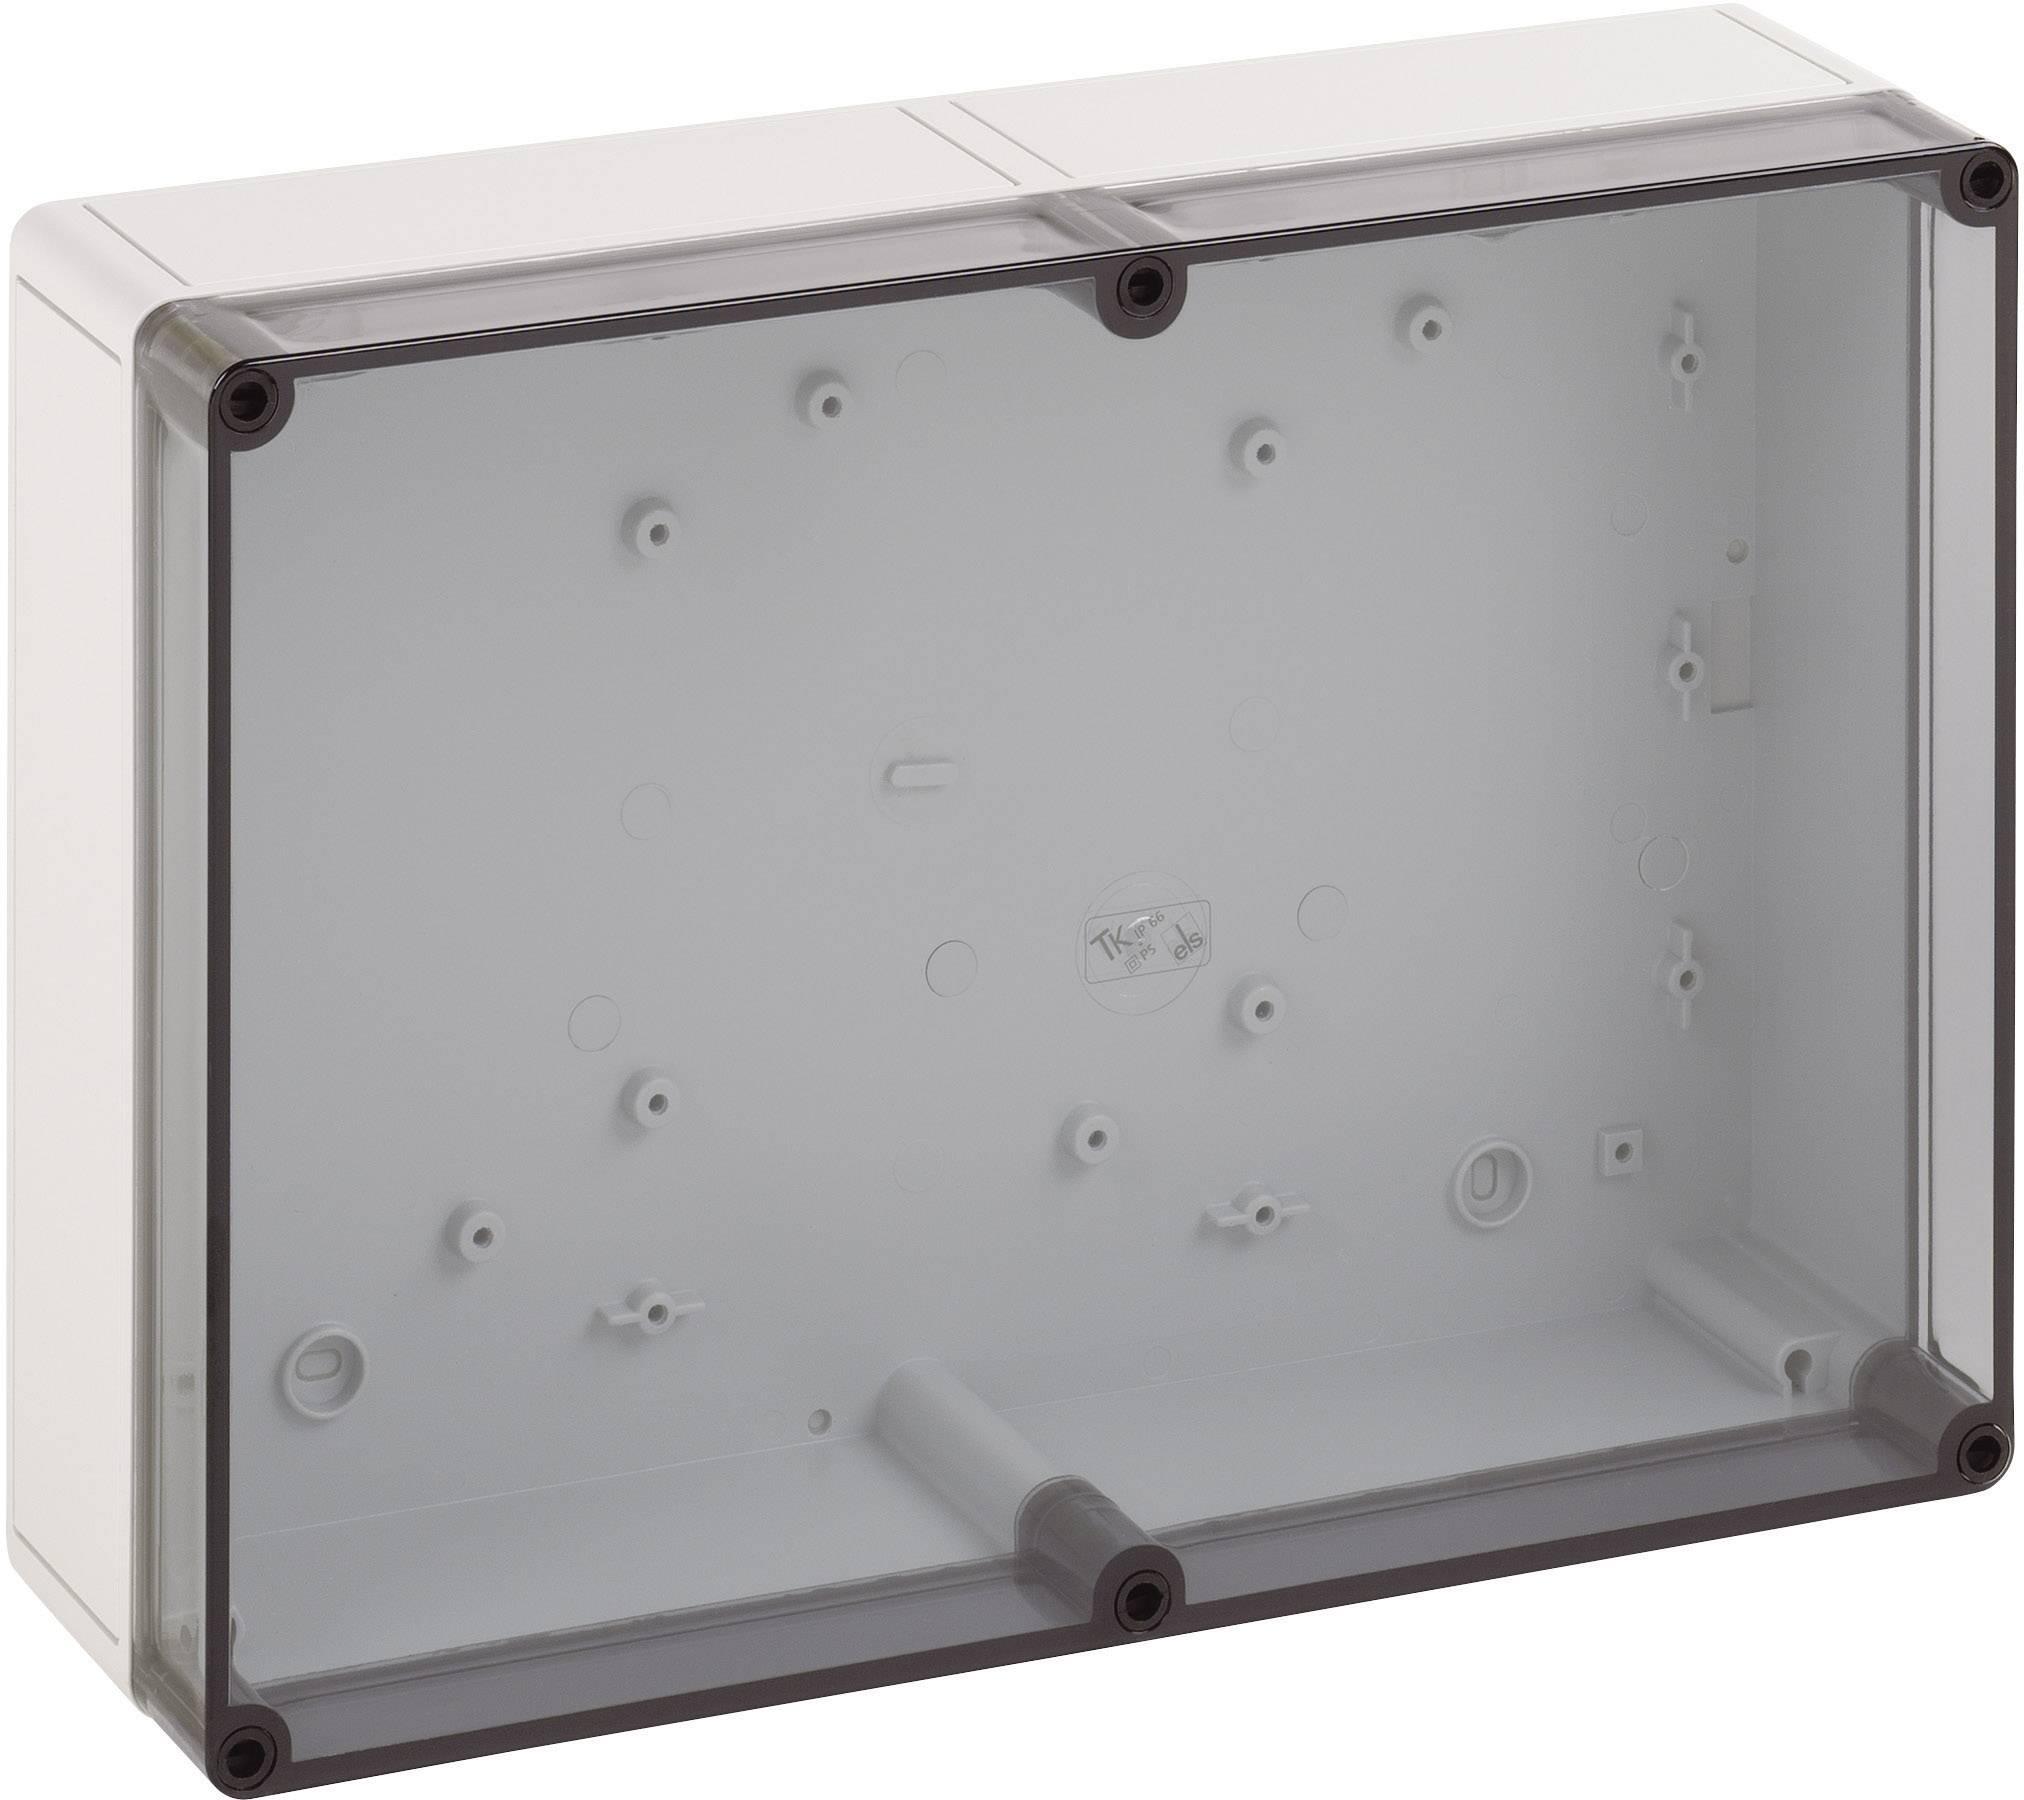 Inštalačná krabička Spelsberg TK PS 2518-6f-t 11101101, (d x š x v) 254 x 180 x 63 mm, polykarbonát, polystyrén, svetlo sivá (RAL 7035), 1 ks